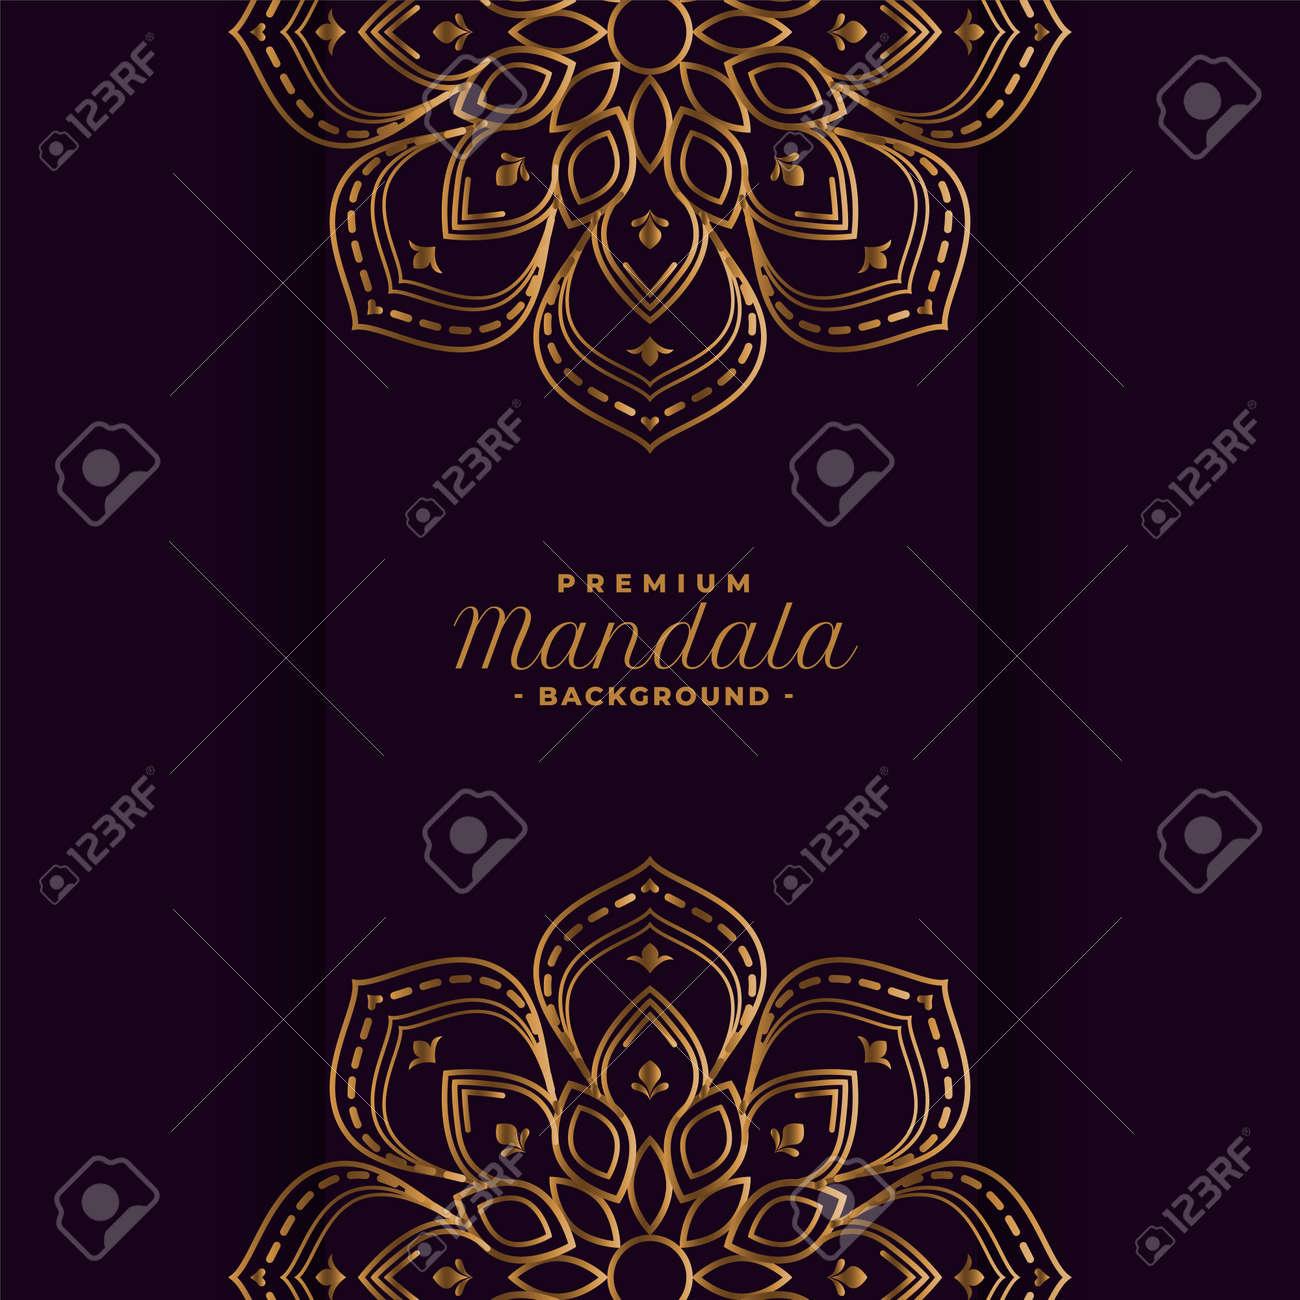 golden mandala decorative background design - 167909873